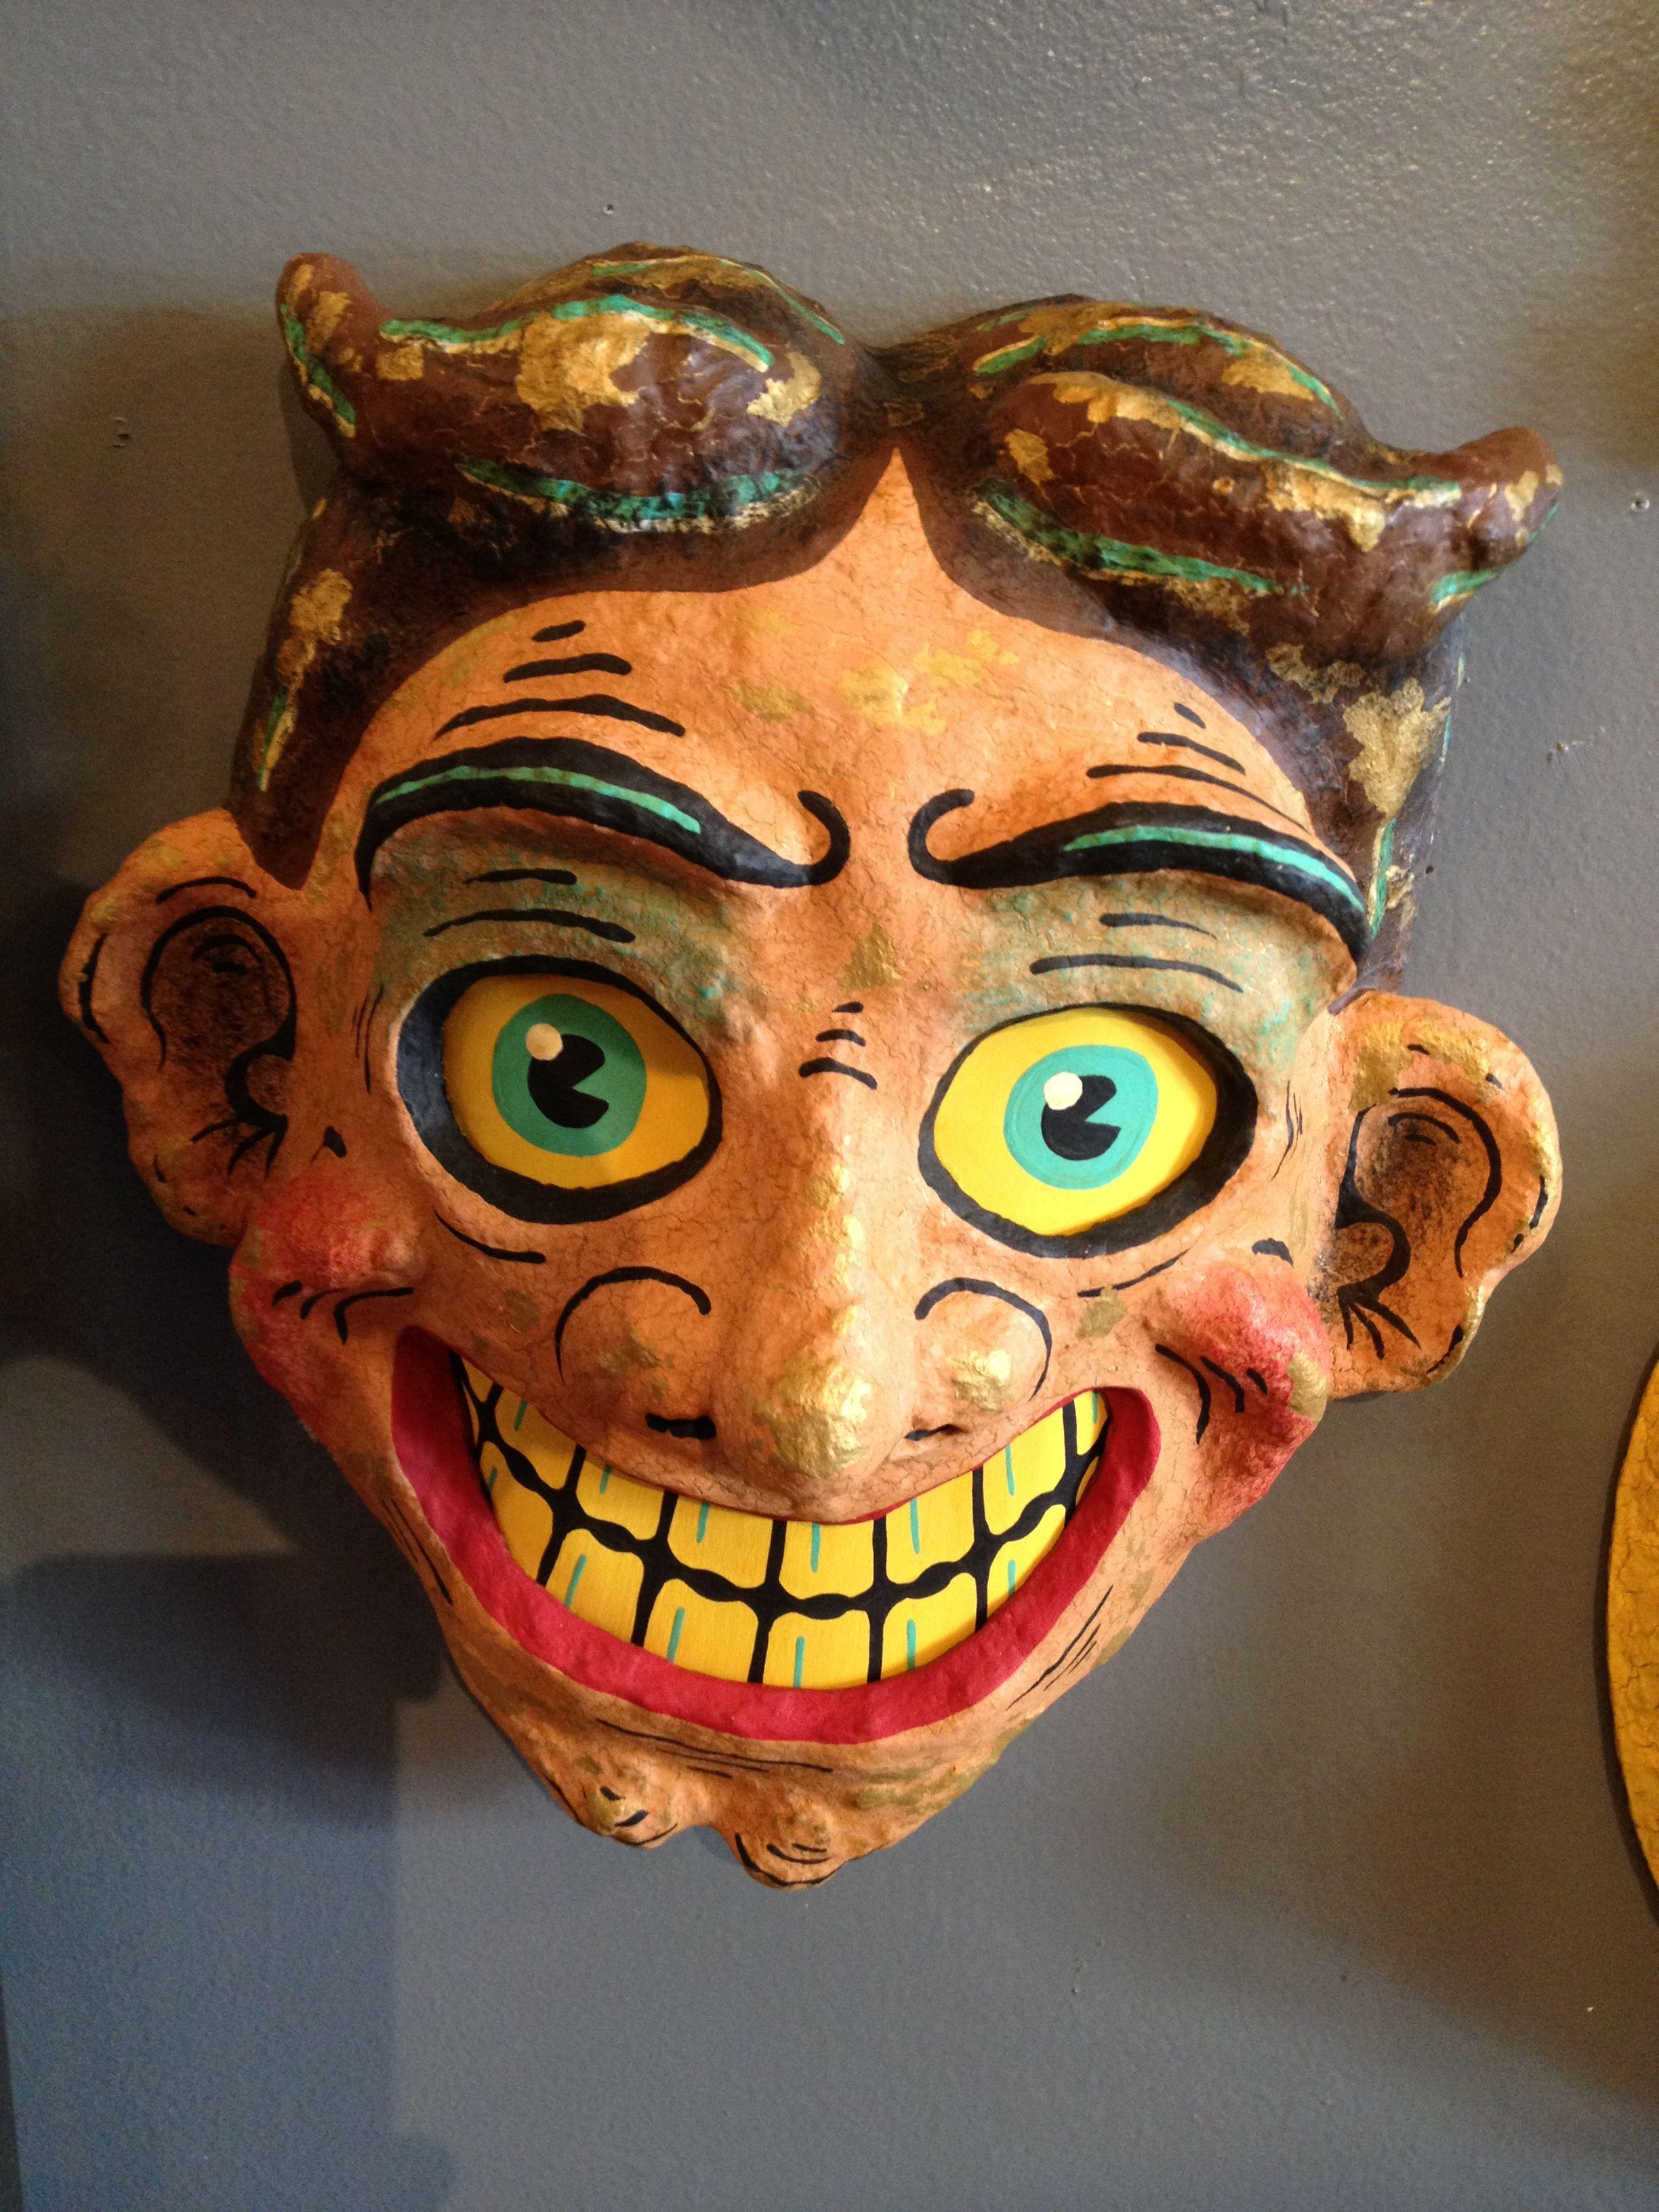 Paper mache mask pop cycle by mam craw loupe odditorium inspiration pinterest paper - Masque papier mache ...